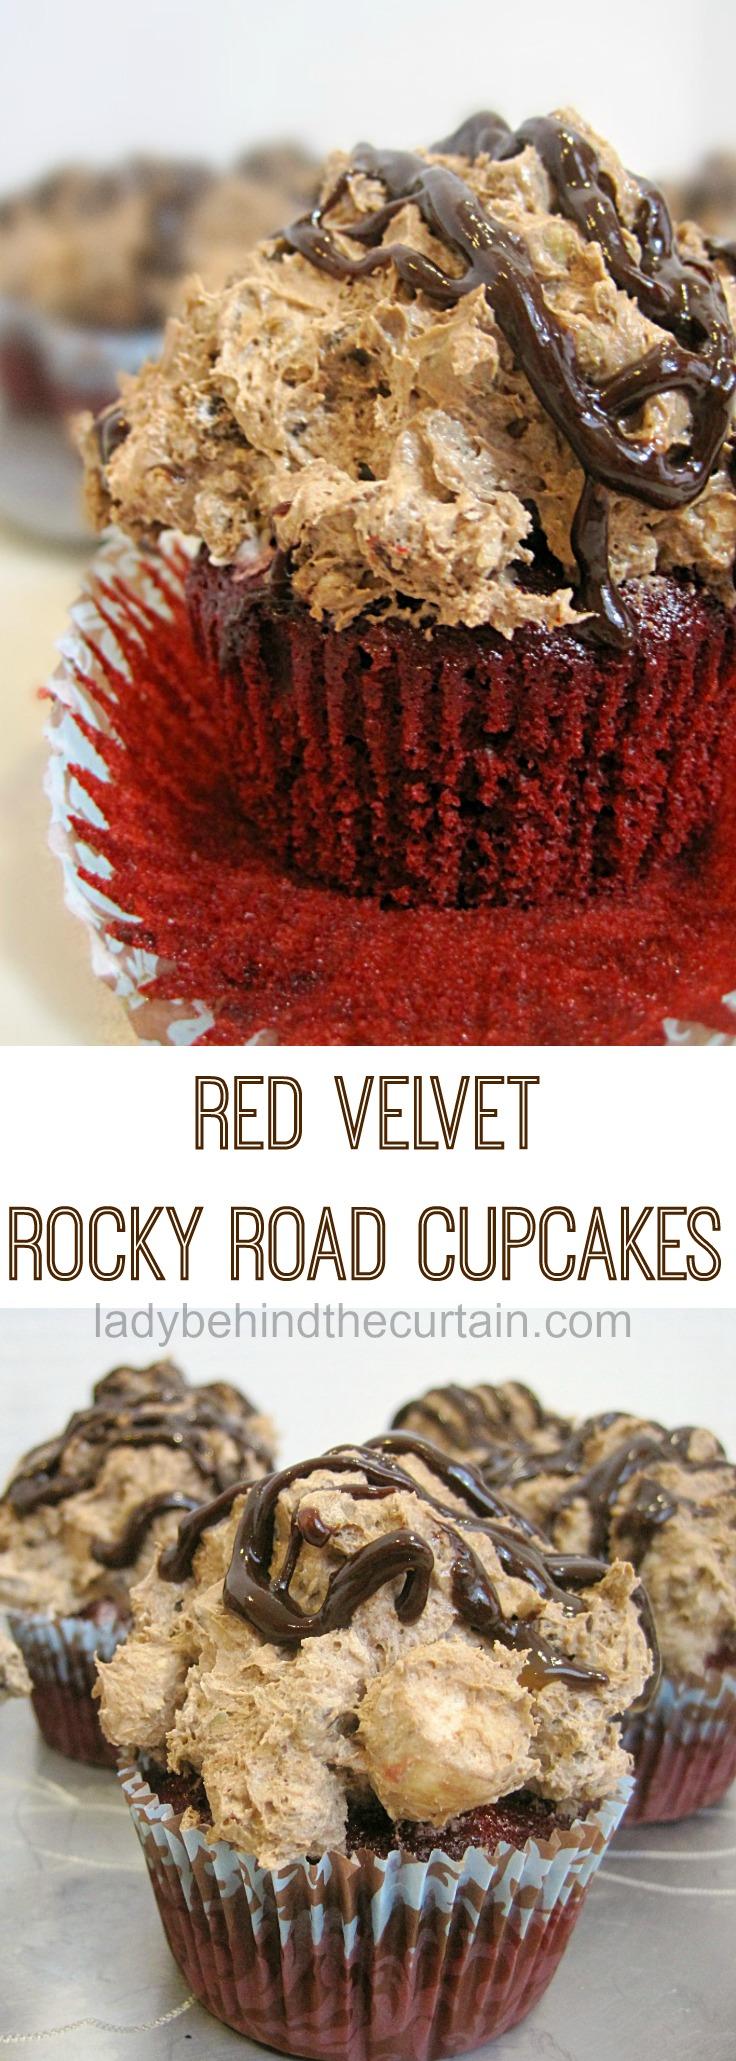 Red Velvet Rocky Road Cupcakes | rocky road recipe, rocky road ice cream, semi homemade cupcakes, cake mix cupcakes